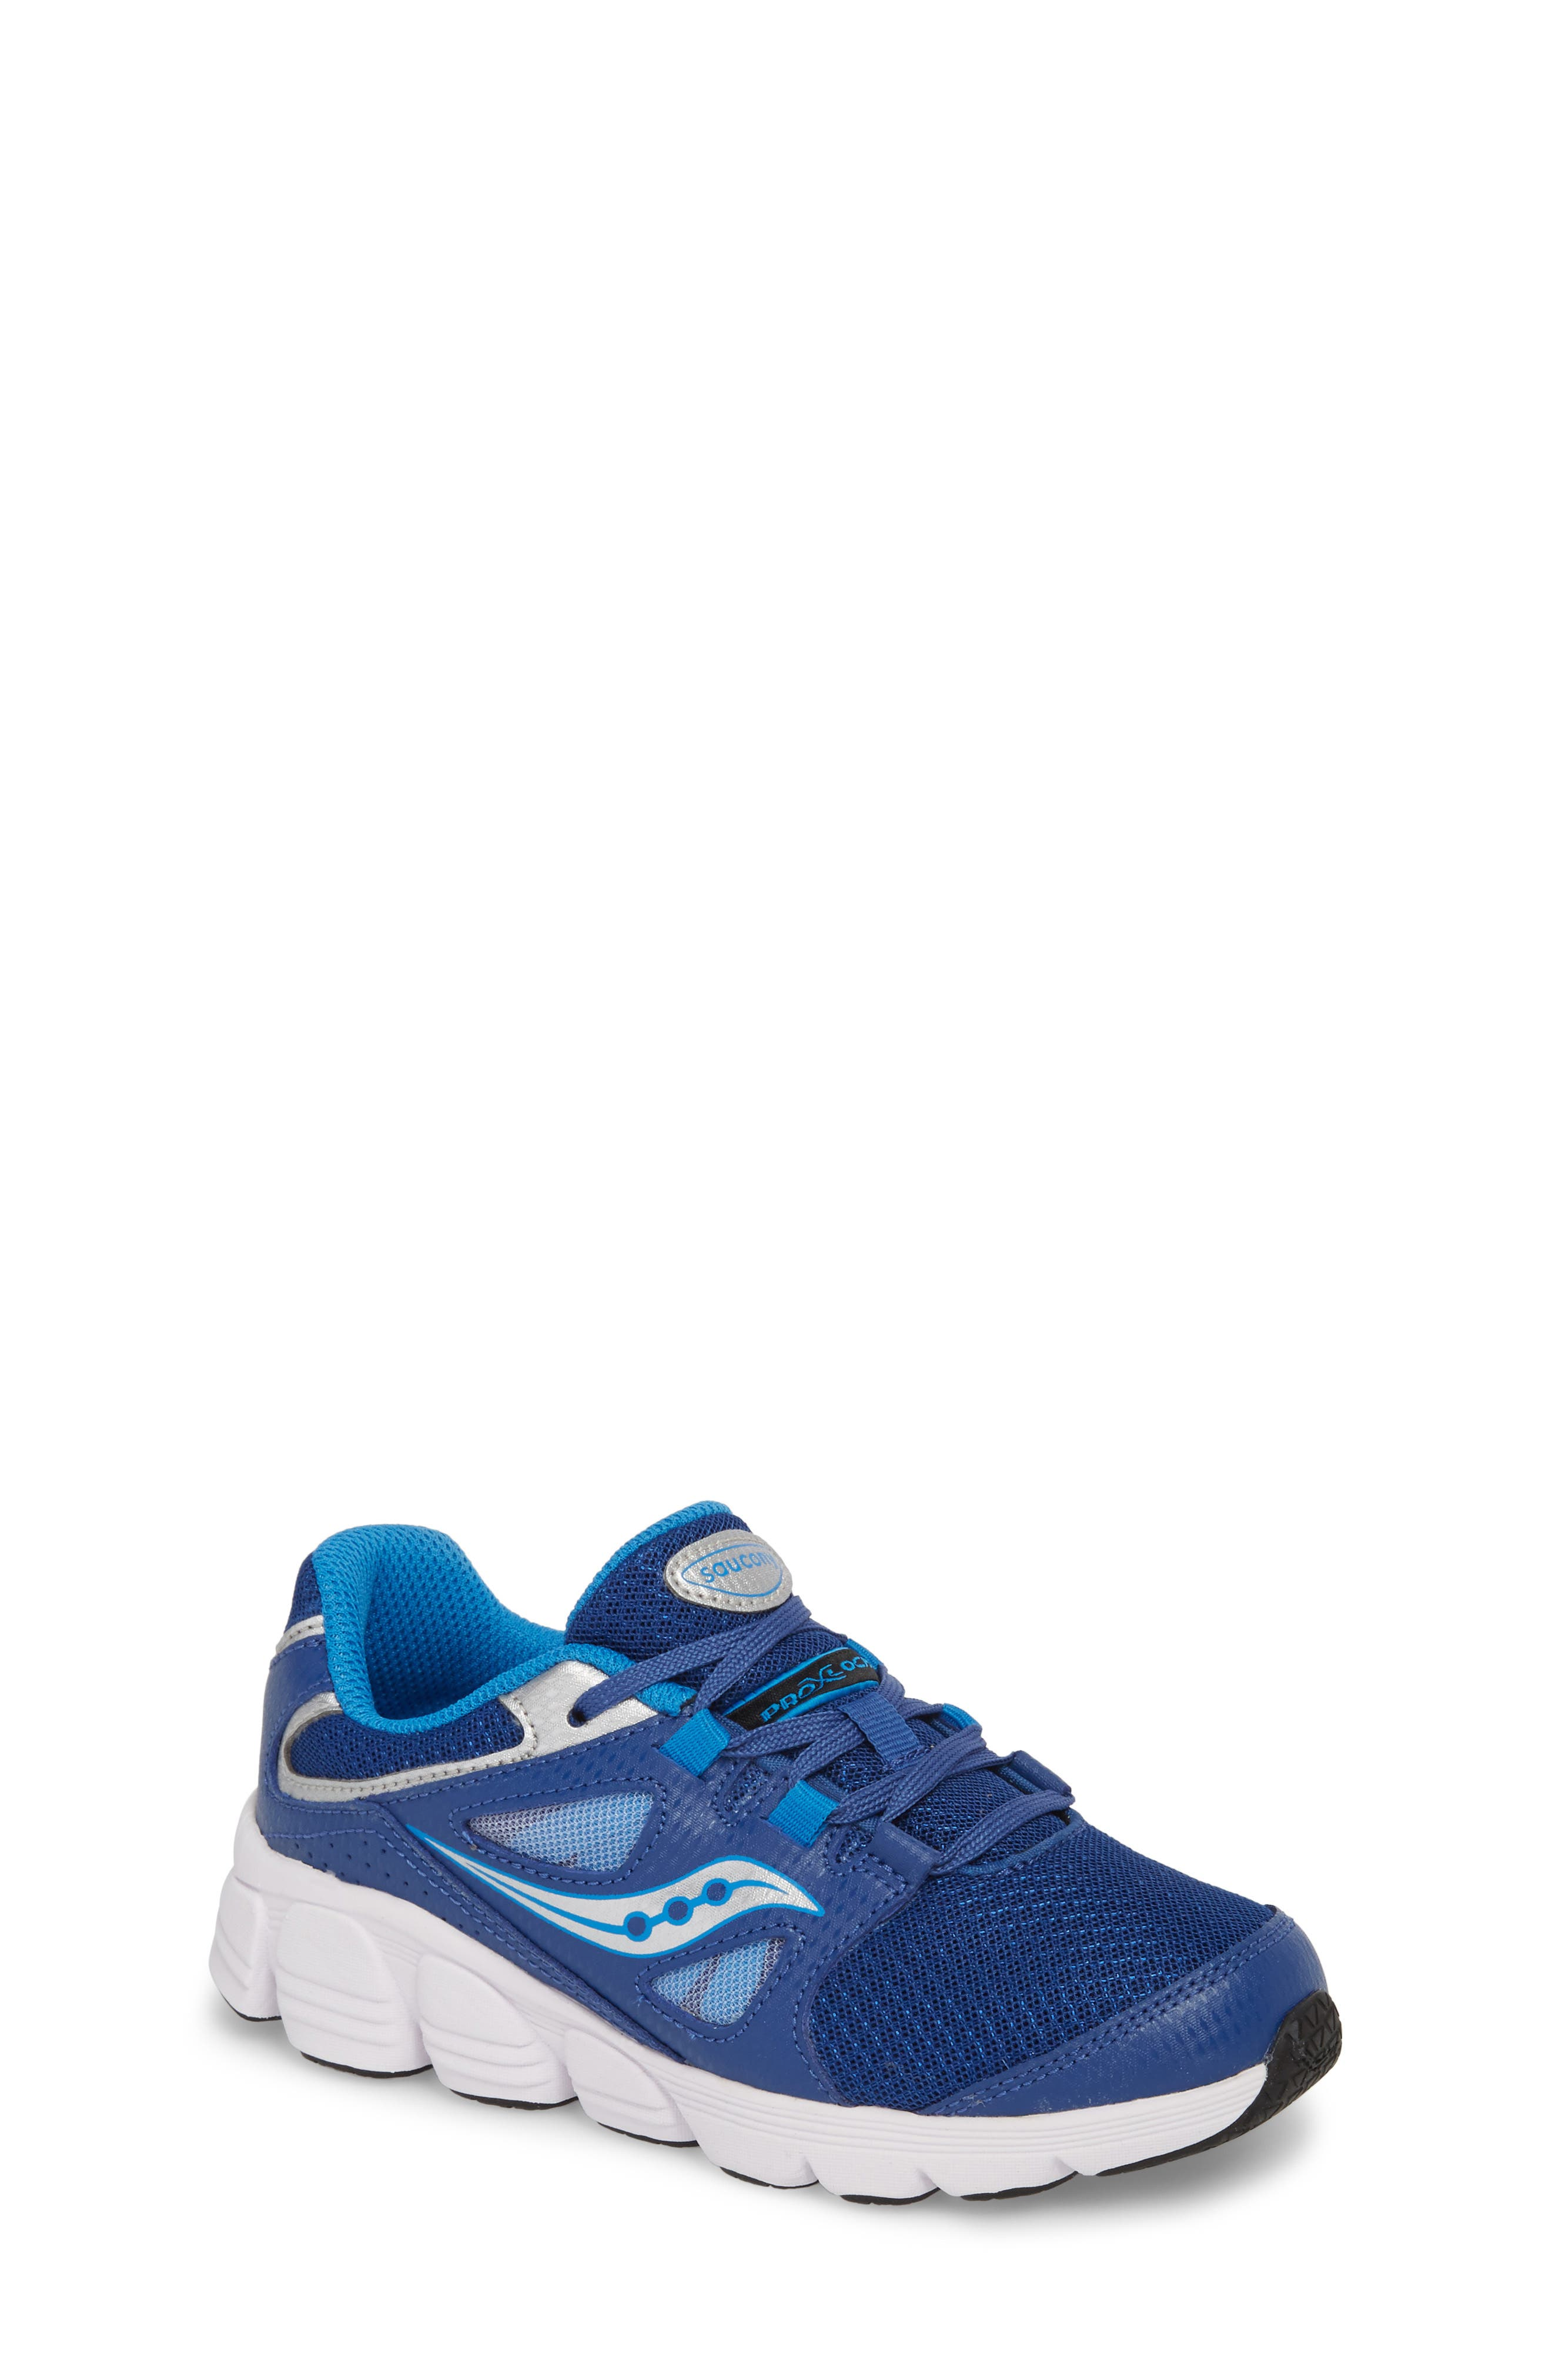 Kotaro 4 Sneaker,                             Main thumbnail 1, color,                             400